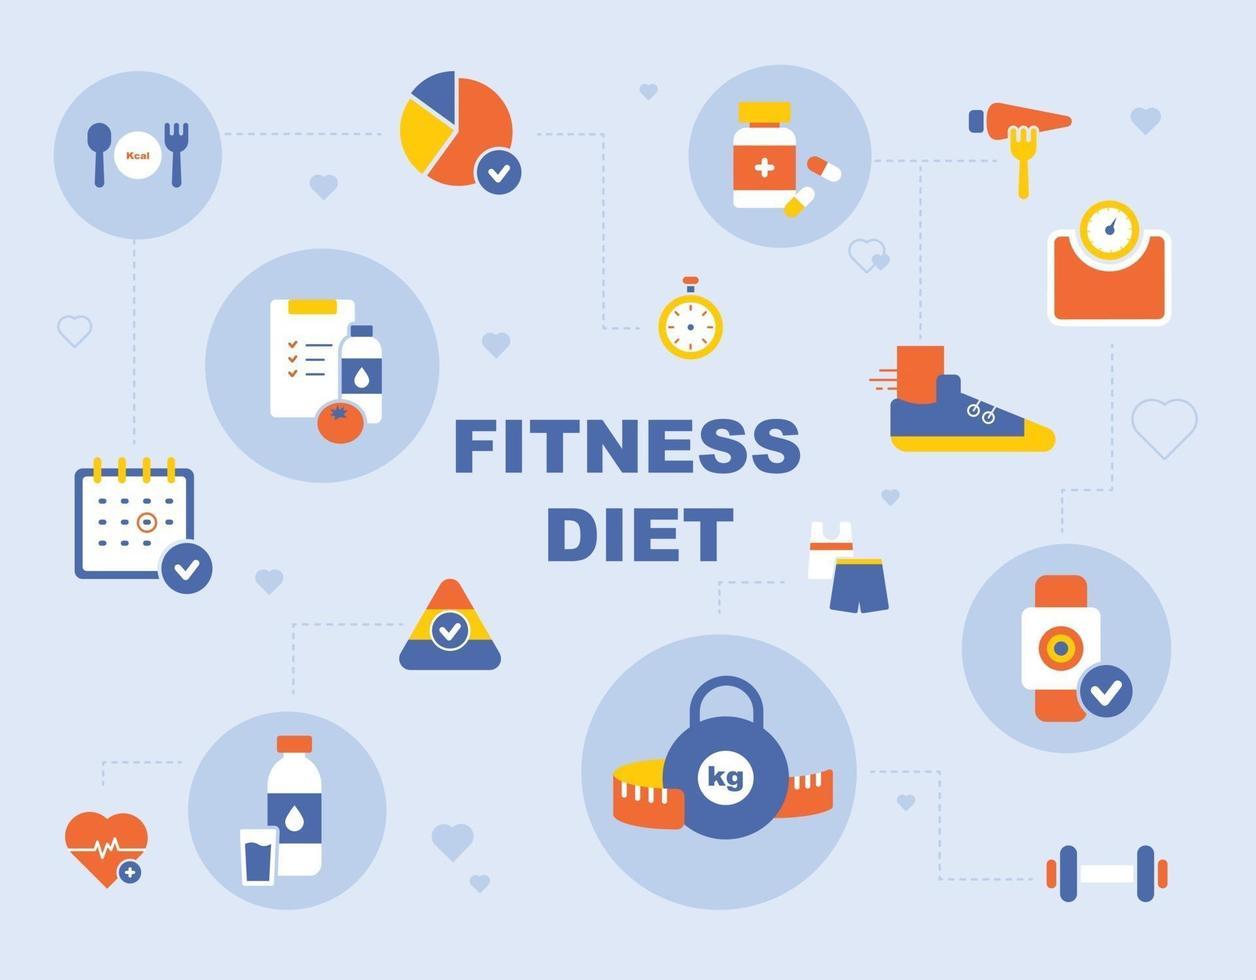 fitness ikon affisch. platt designstil minimal vektorillustration. vektor